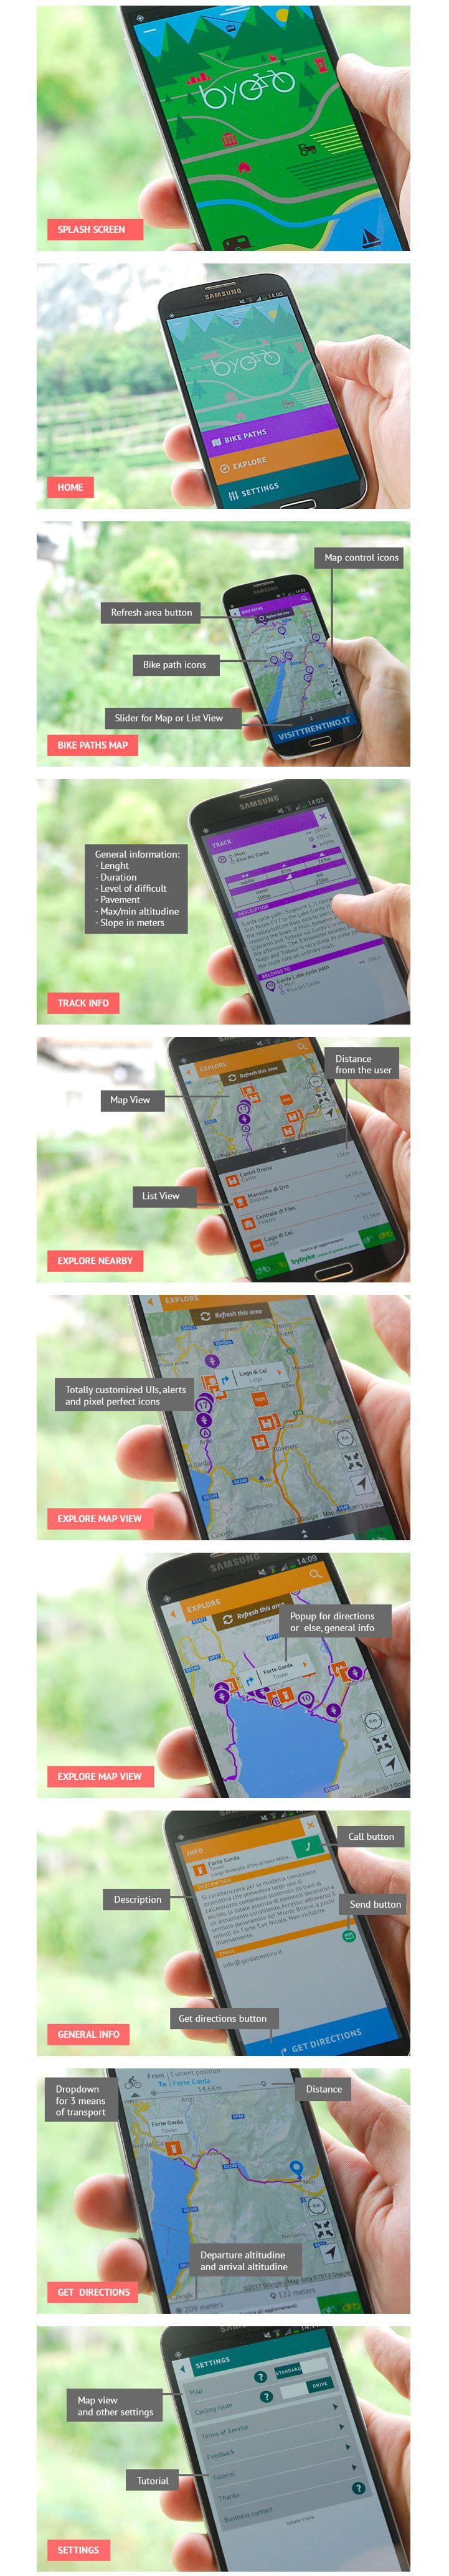 Bybyke® mobile app #mobile #app #design #ux #ui #sport #bike